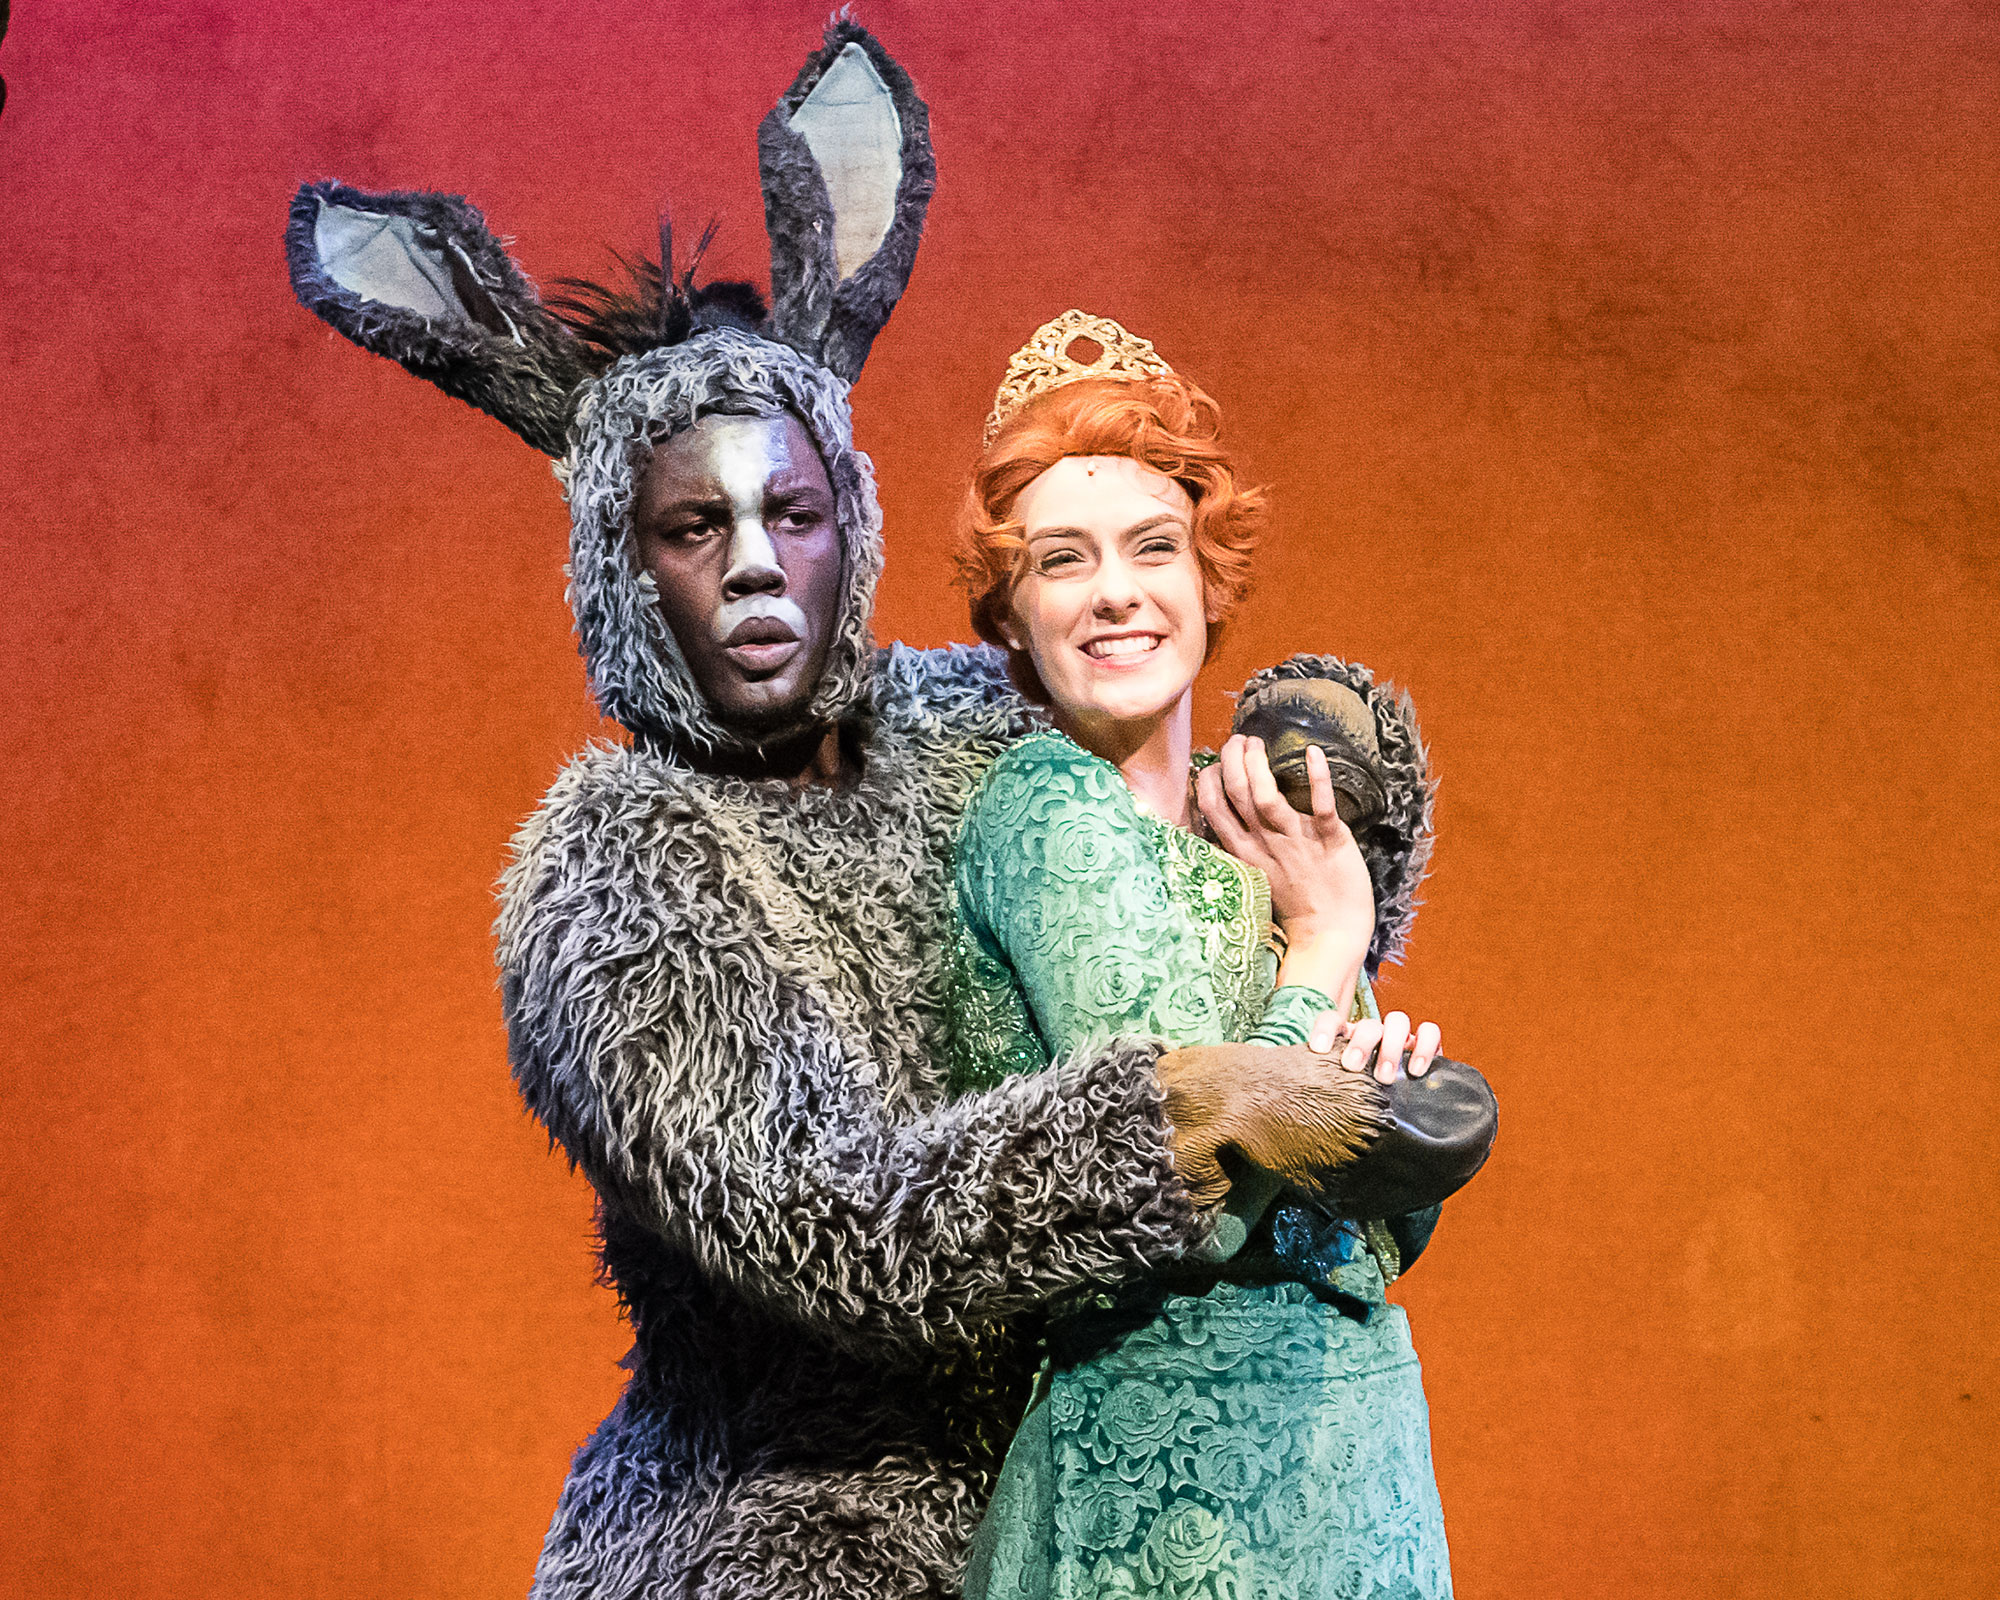 Remell-Bowens-(Donkey)-and-Natalie-Steen-(Fiona),-Photo-Credit-Andy-Dudik.jpg